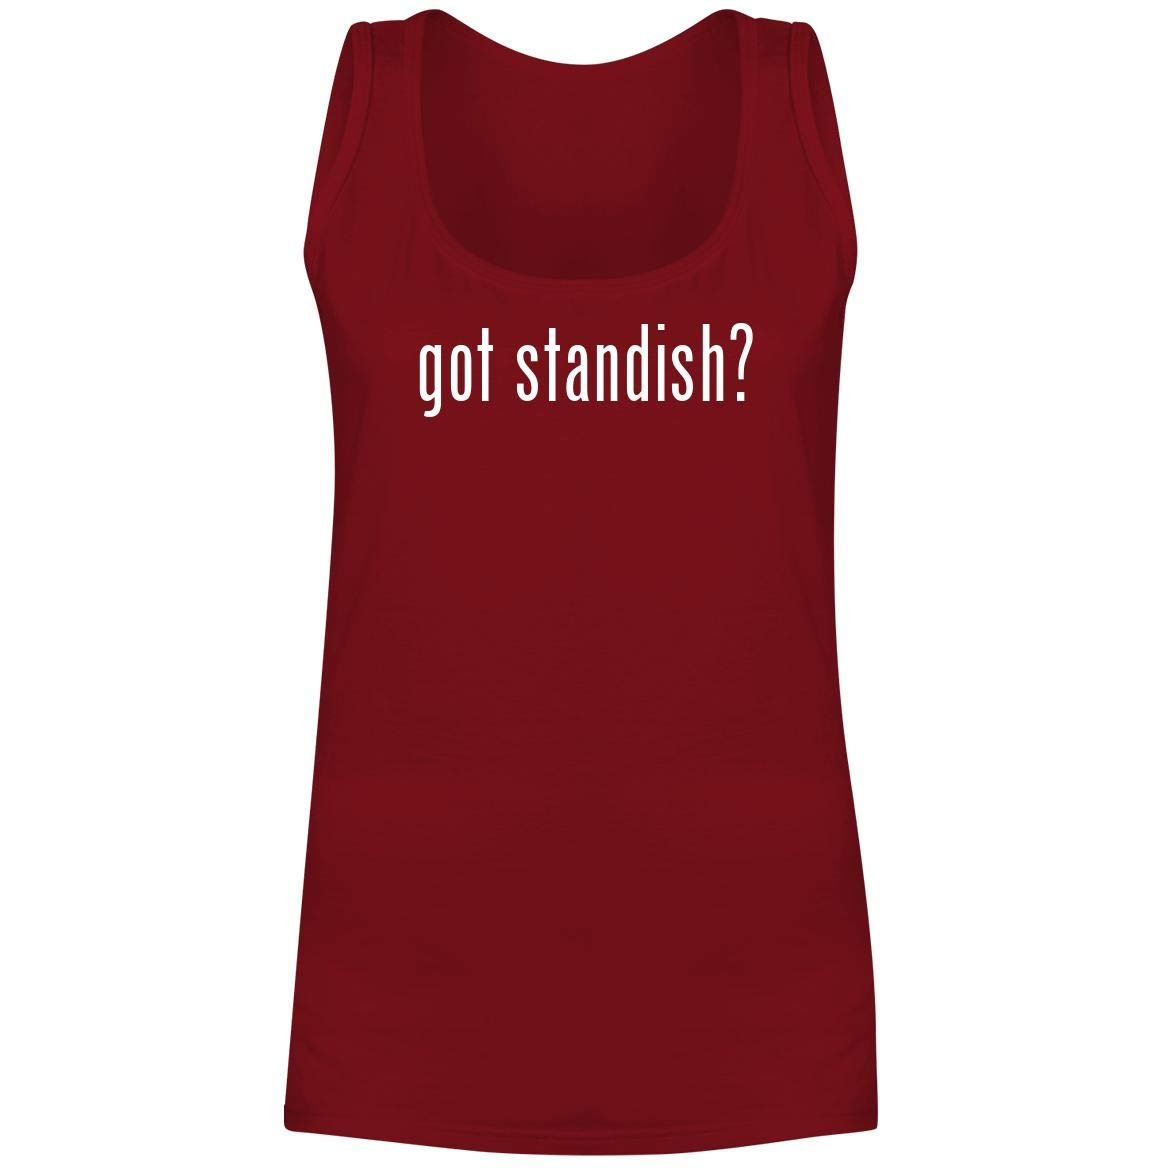 The Town Butler got Standish? - A Soft & Comfortable Women's Tank Top